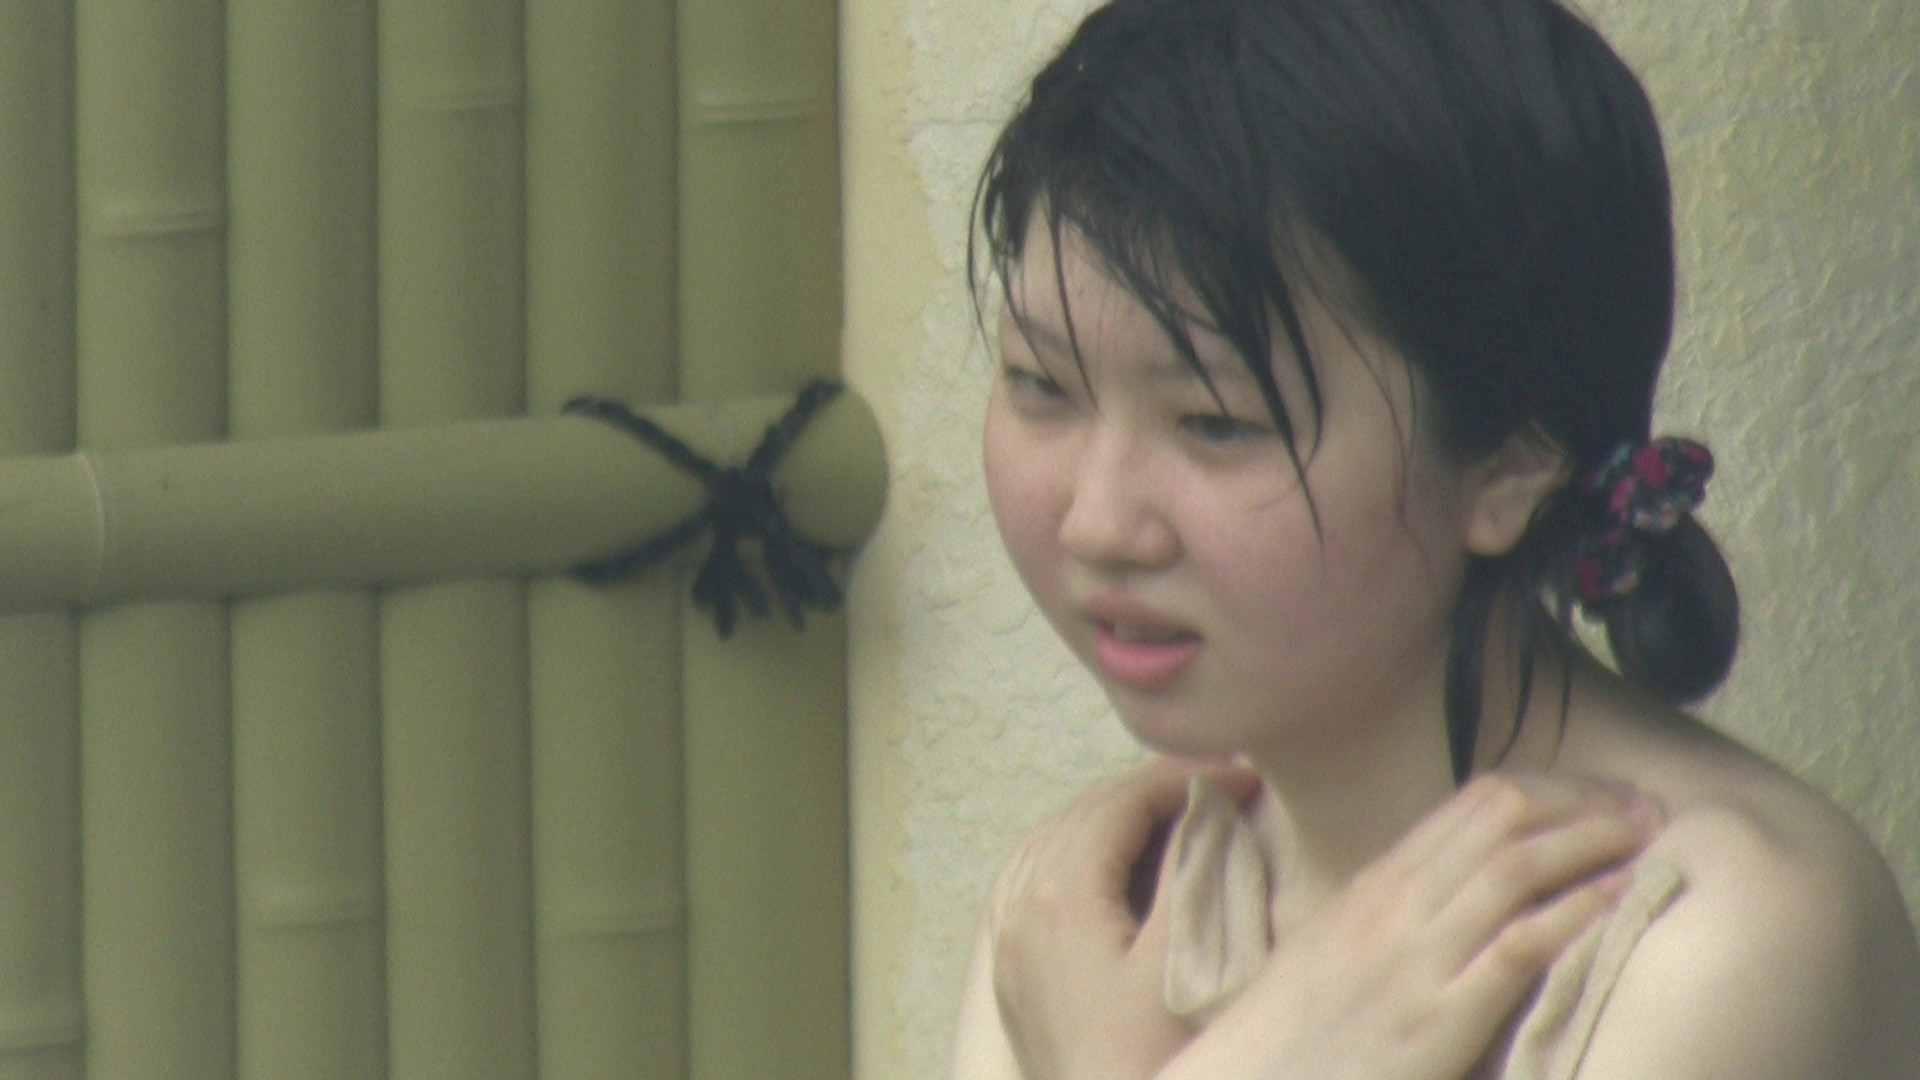 Aquaな露天風呂Vol.128 盗撮 | HなOL  51pic 30